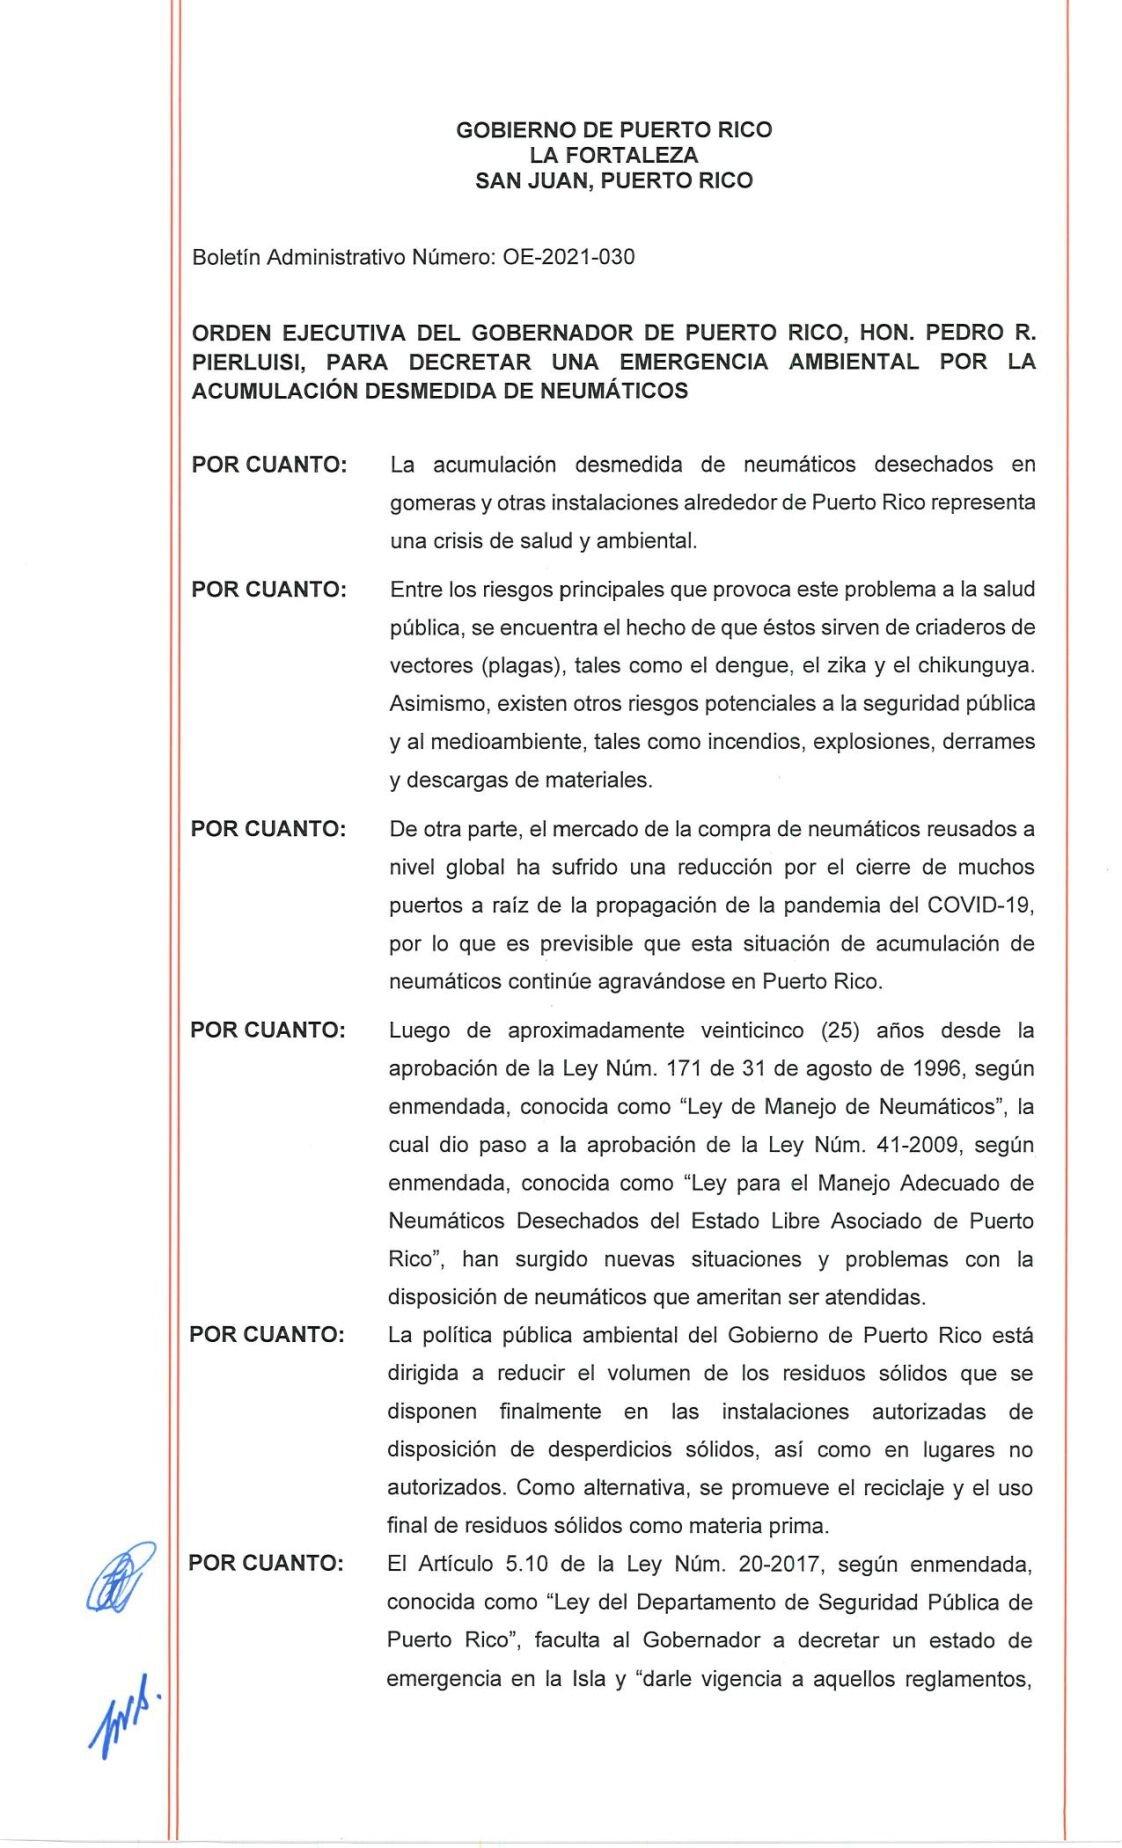 Orden Ejecutiva 2021-030